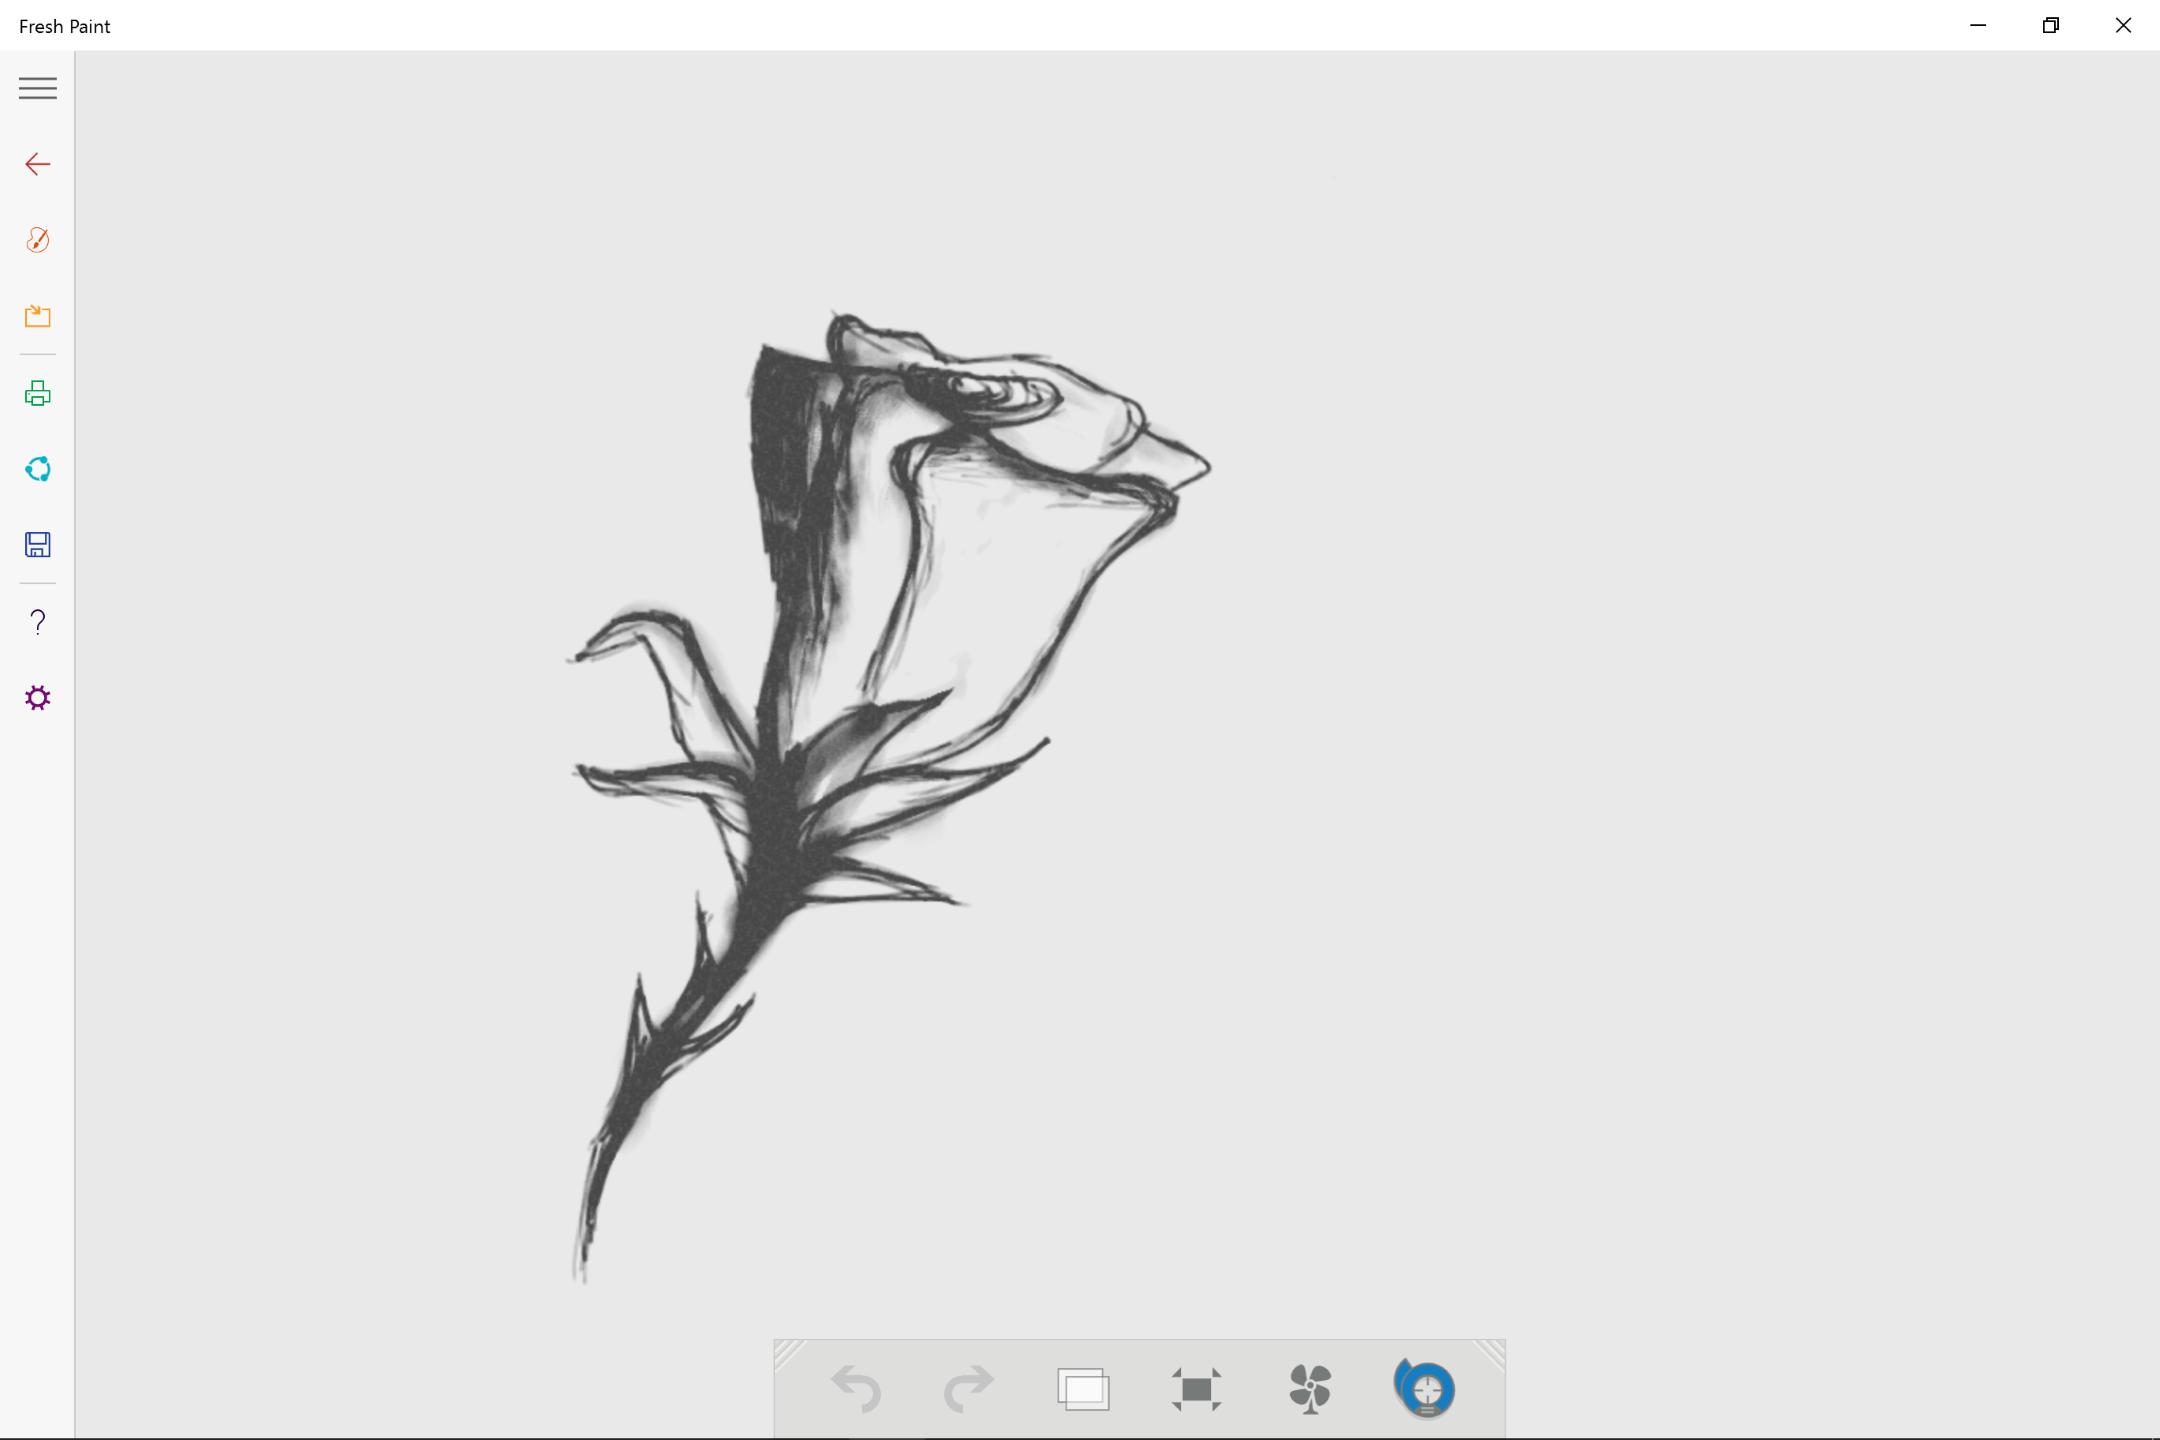 Surface Pen Zeichnen Freshpaint